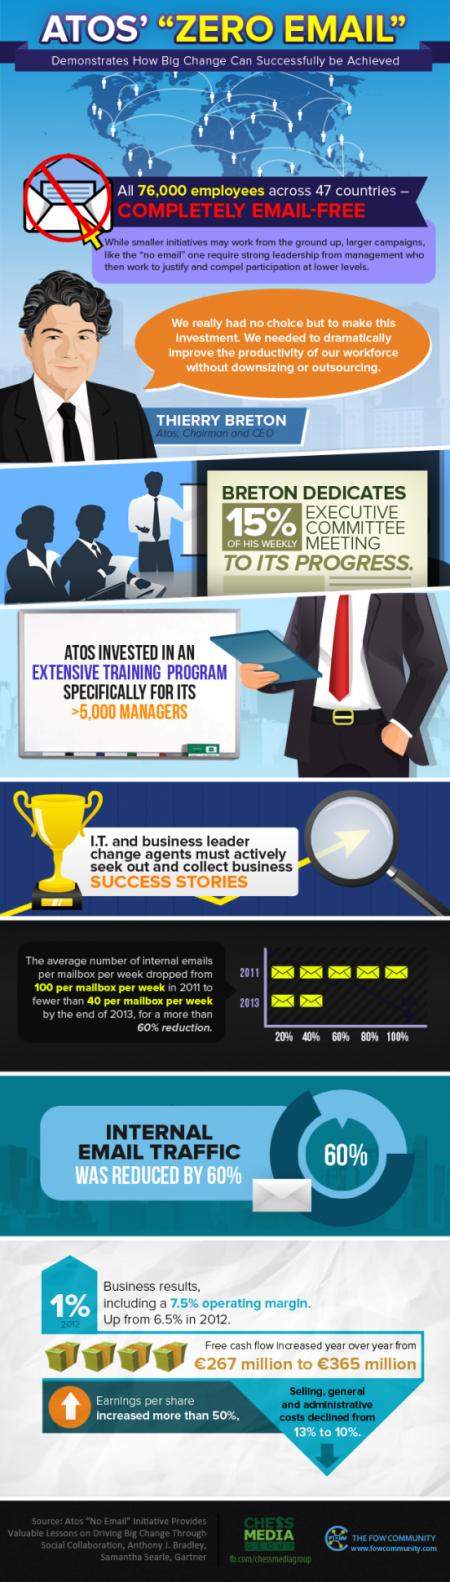 Atos-Infographic0209-24-13-552x1940